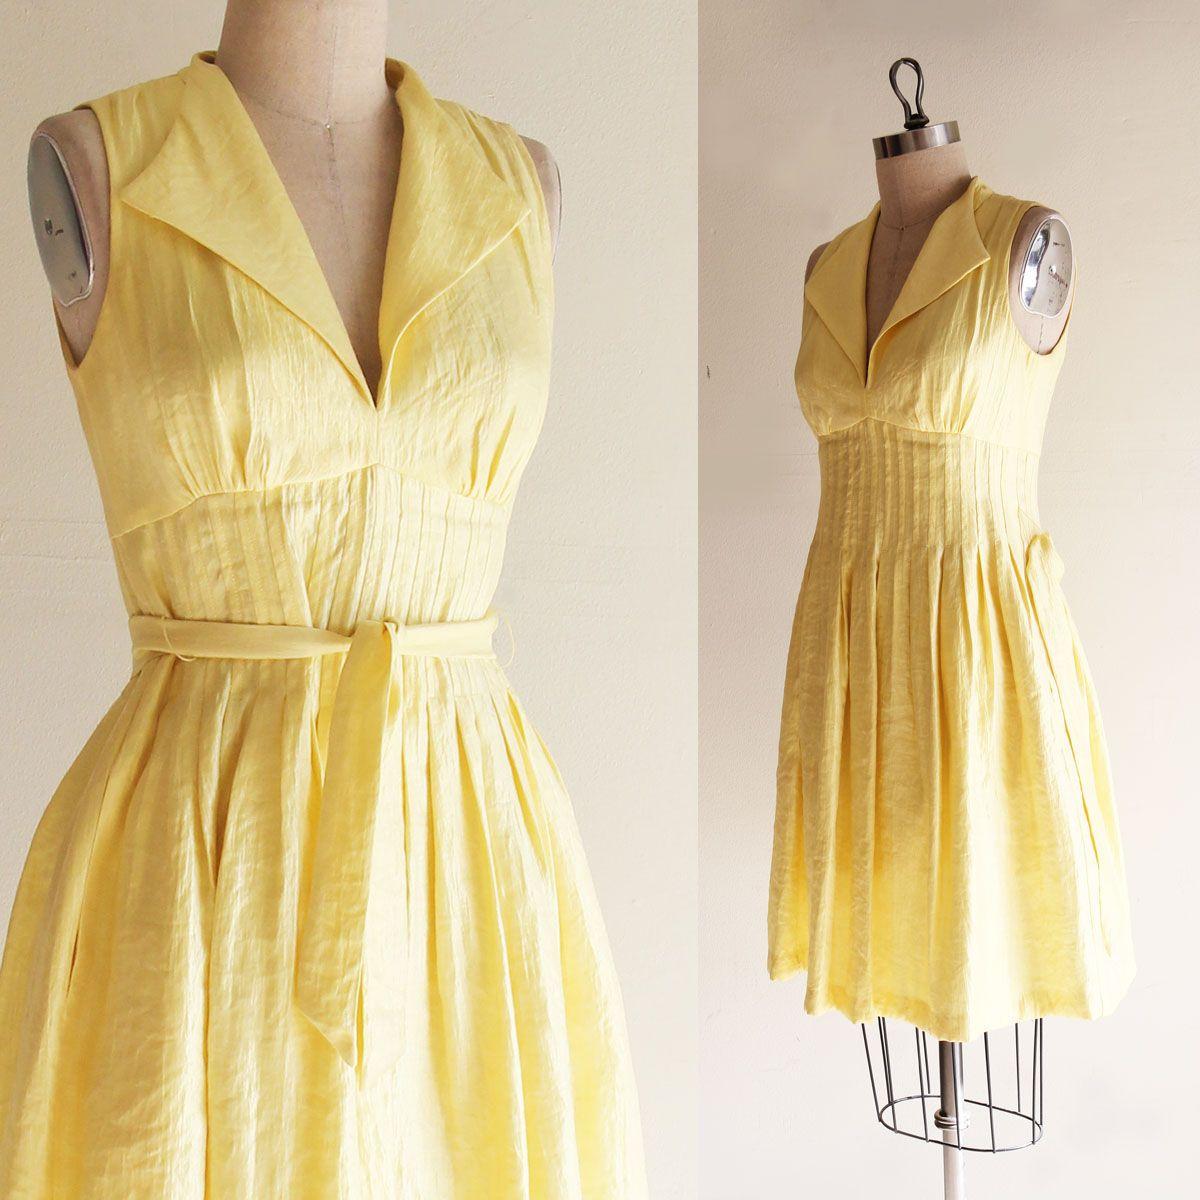 Vintage Maggy London Sunshine Yellow Sleeveless Dress Size 8 Etsy Maggy London Sleeveless Dress 60s Dress